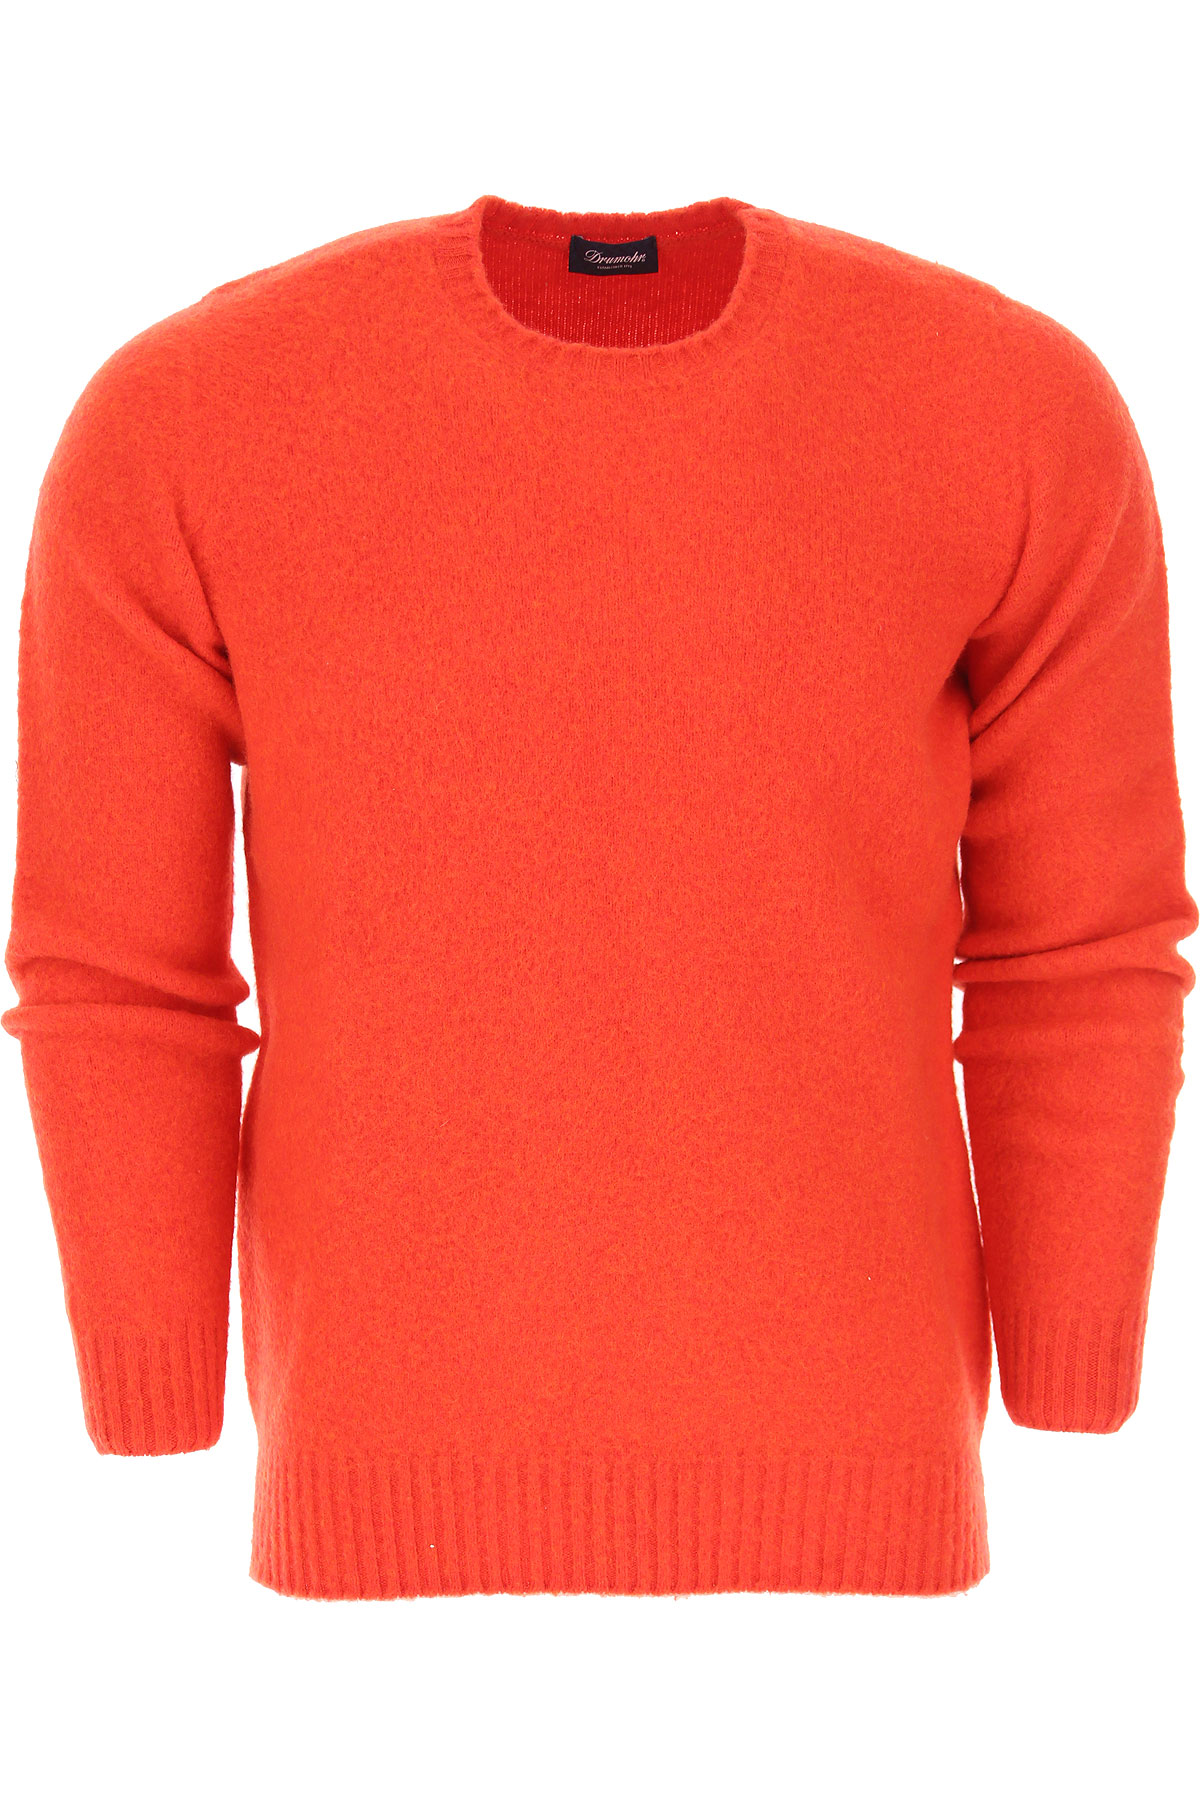 Image of Drumohr Sweater for Men Jumper, Brick Red, Wool, 2017, L M S XL